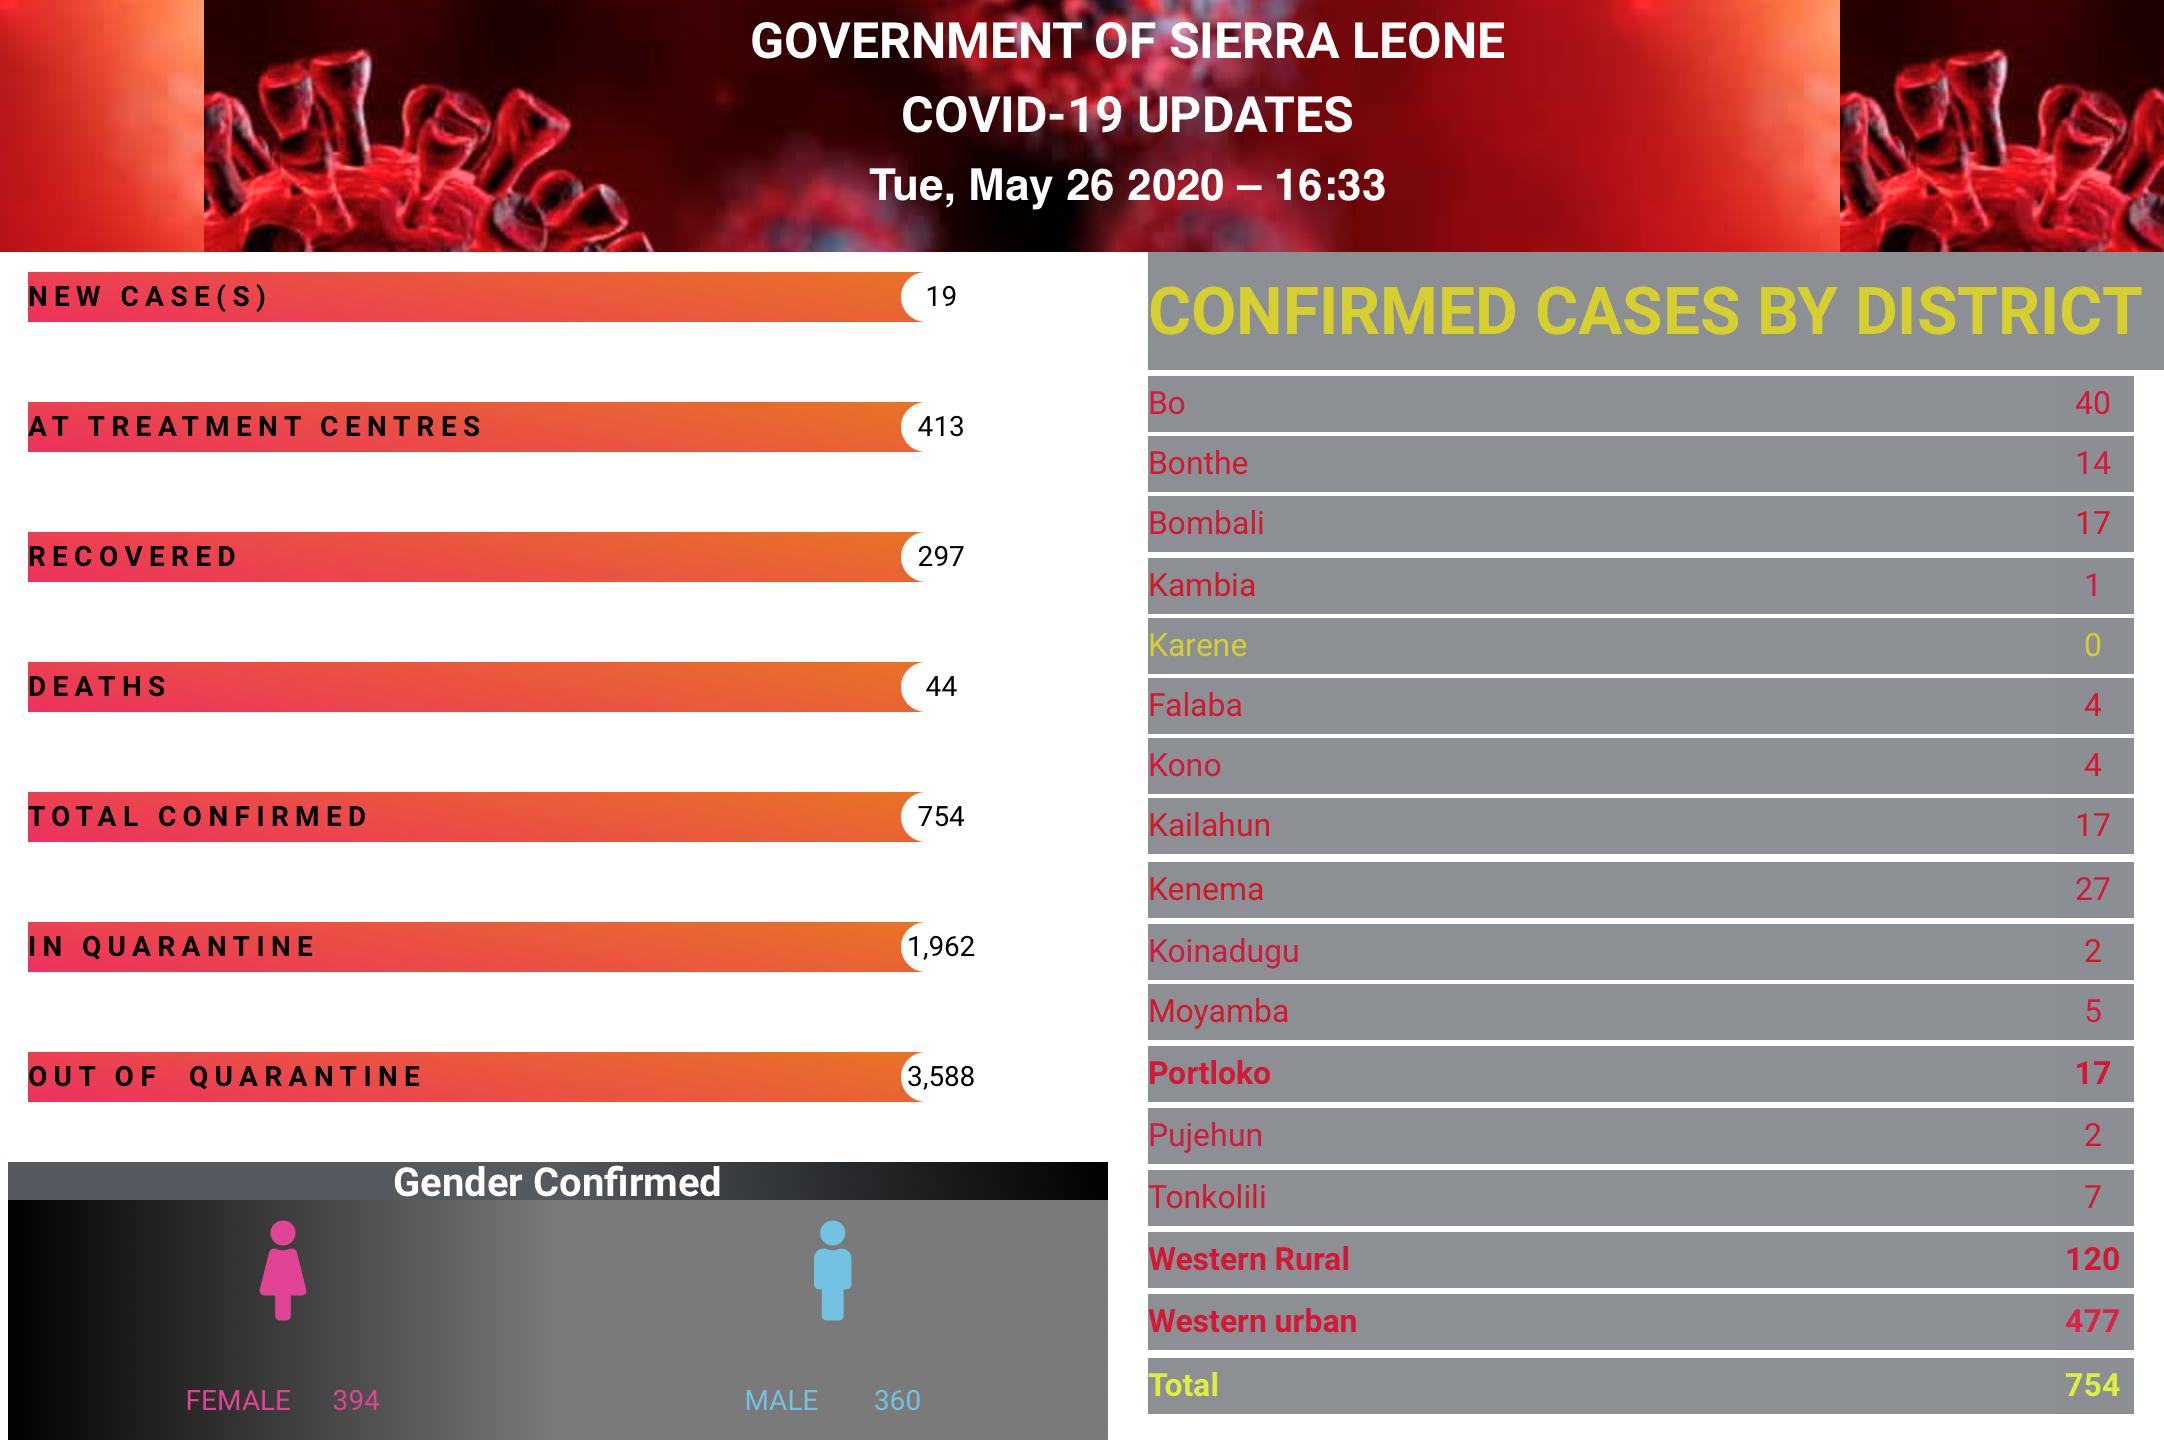 Reporte del Gobierno de Sierra Leona